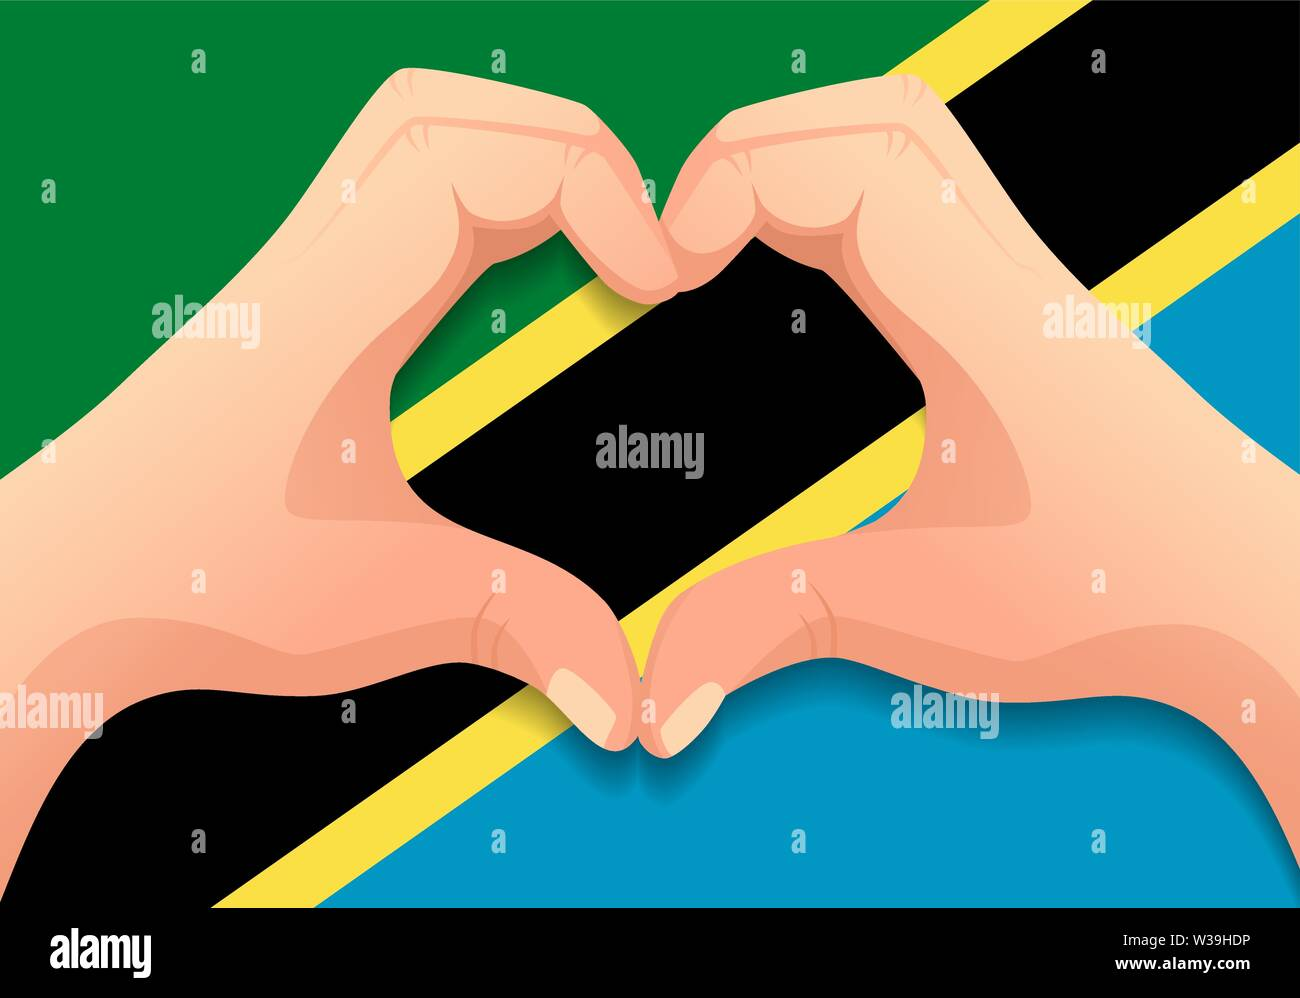 Tanzania flag and hand heart shape. Patriotic background. National flag of Tanzania vector illustration - Stock Image